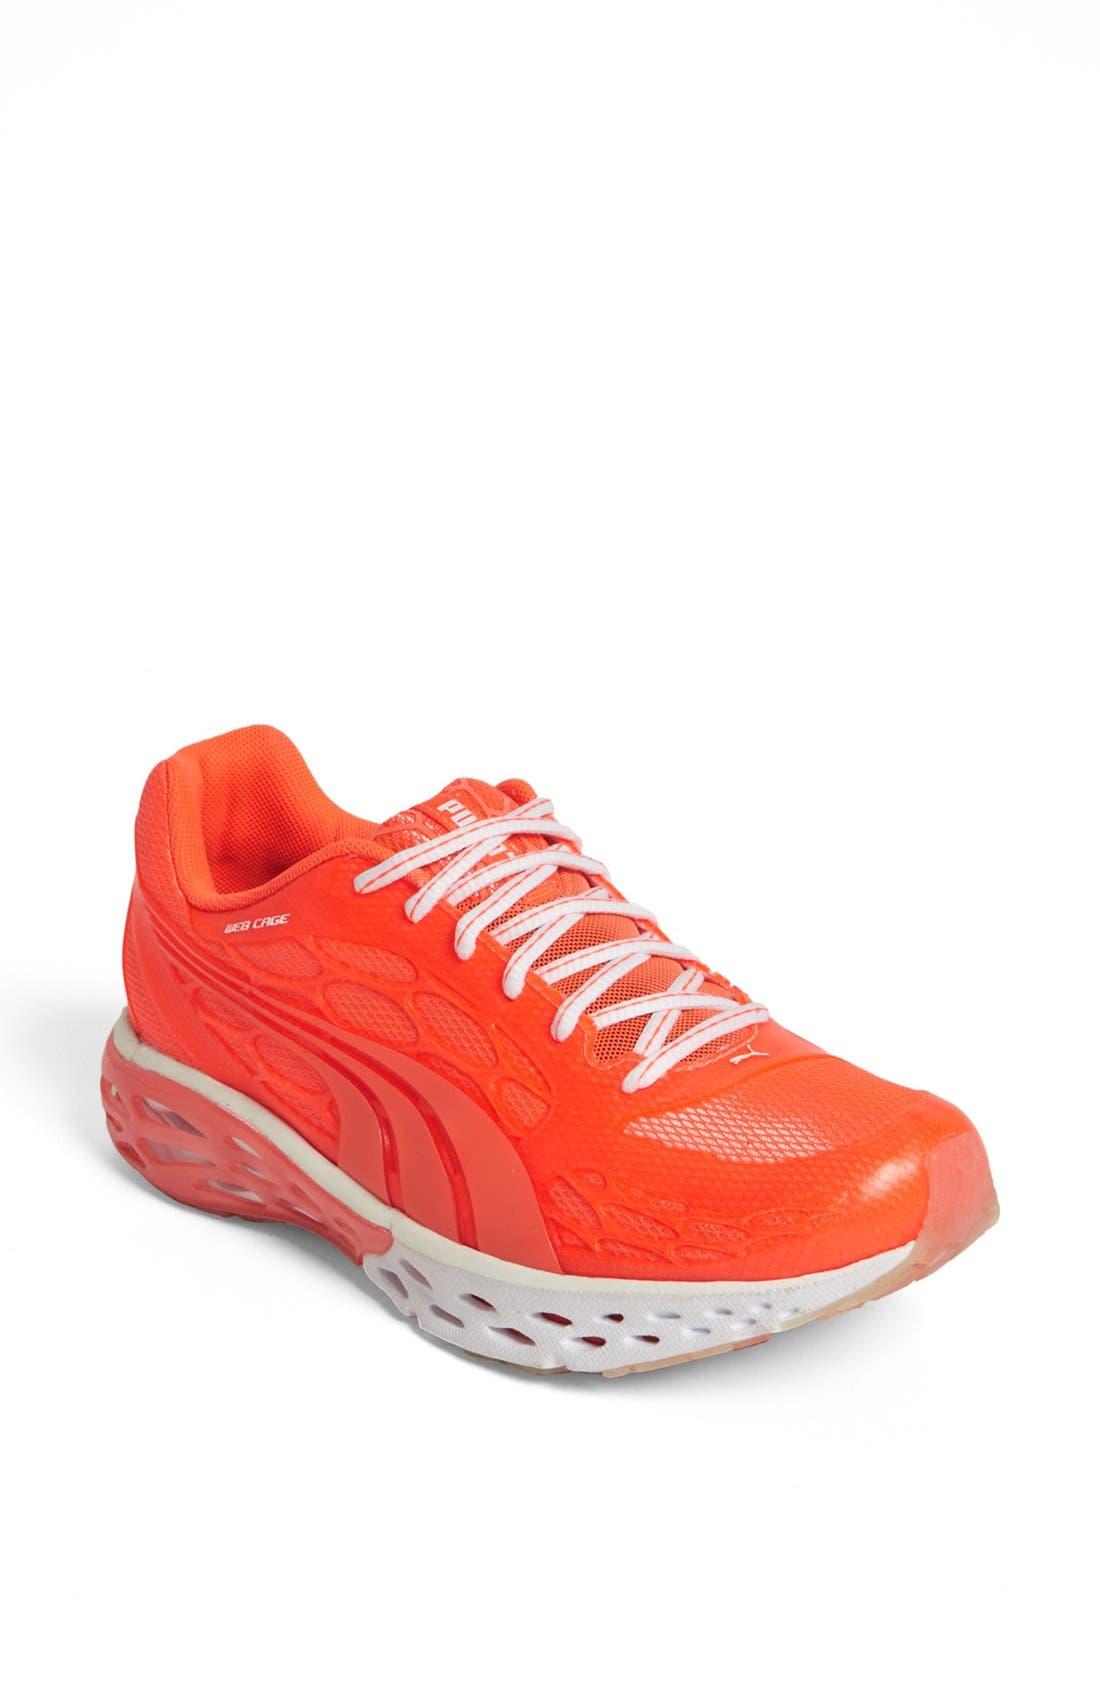 Main Image - PUMA BioWeb Elite Glow Running Shoe (Women)